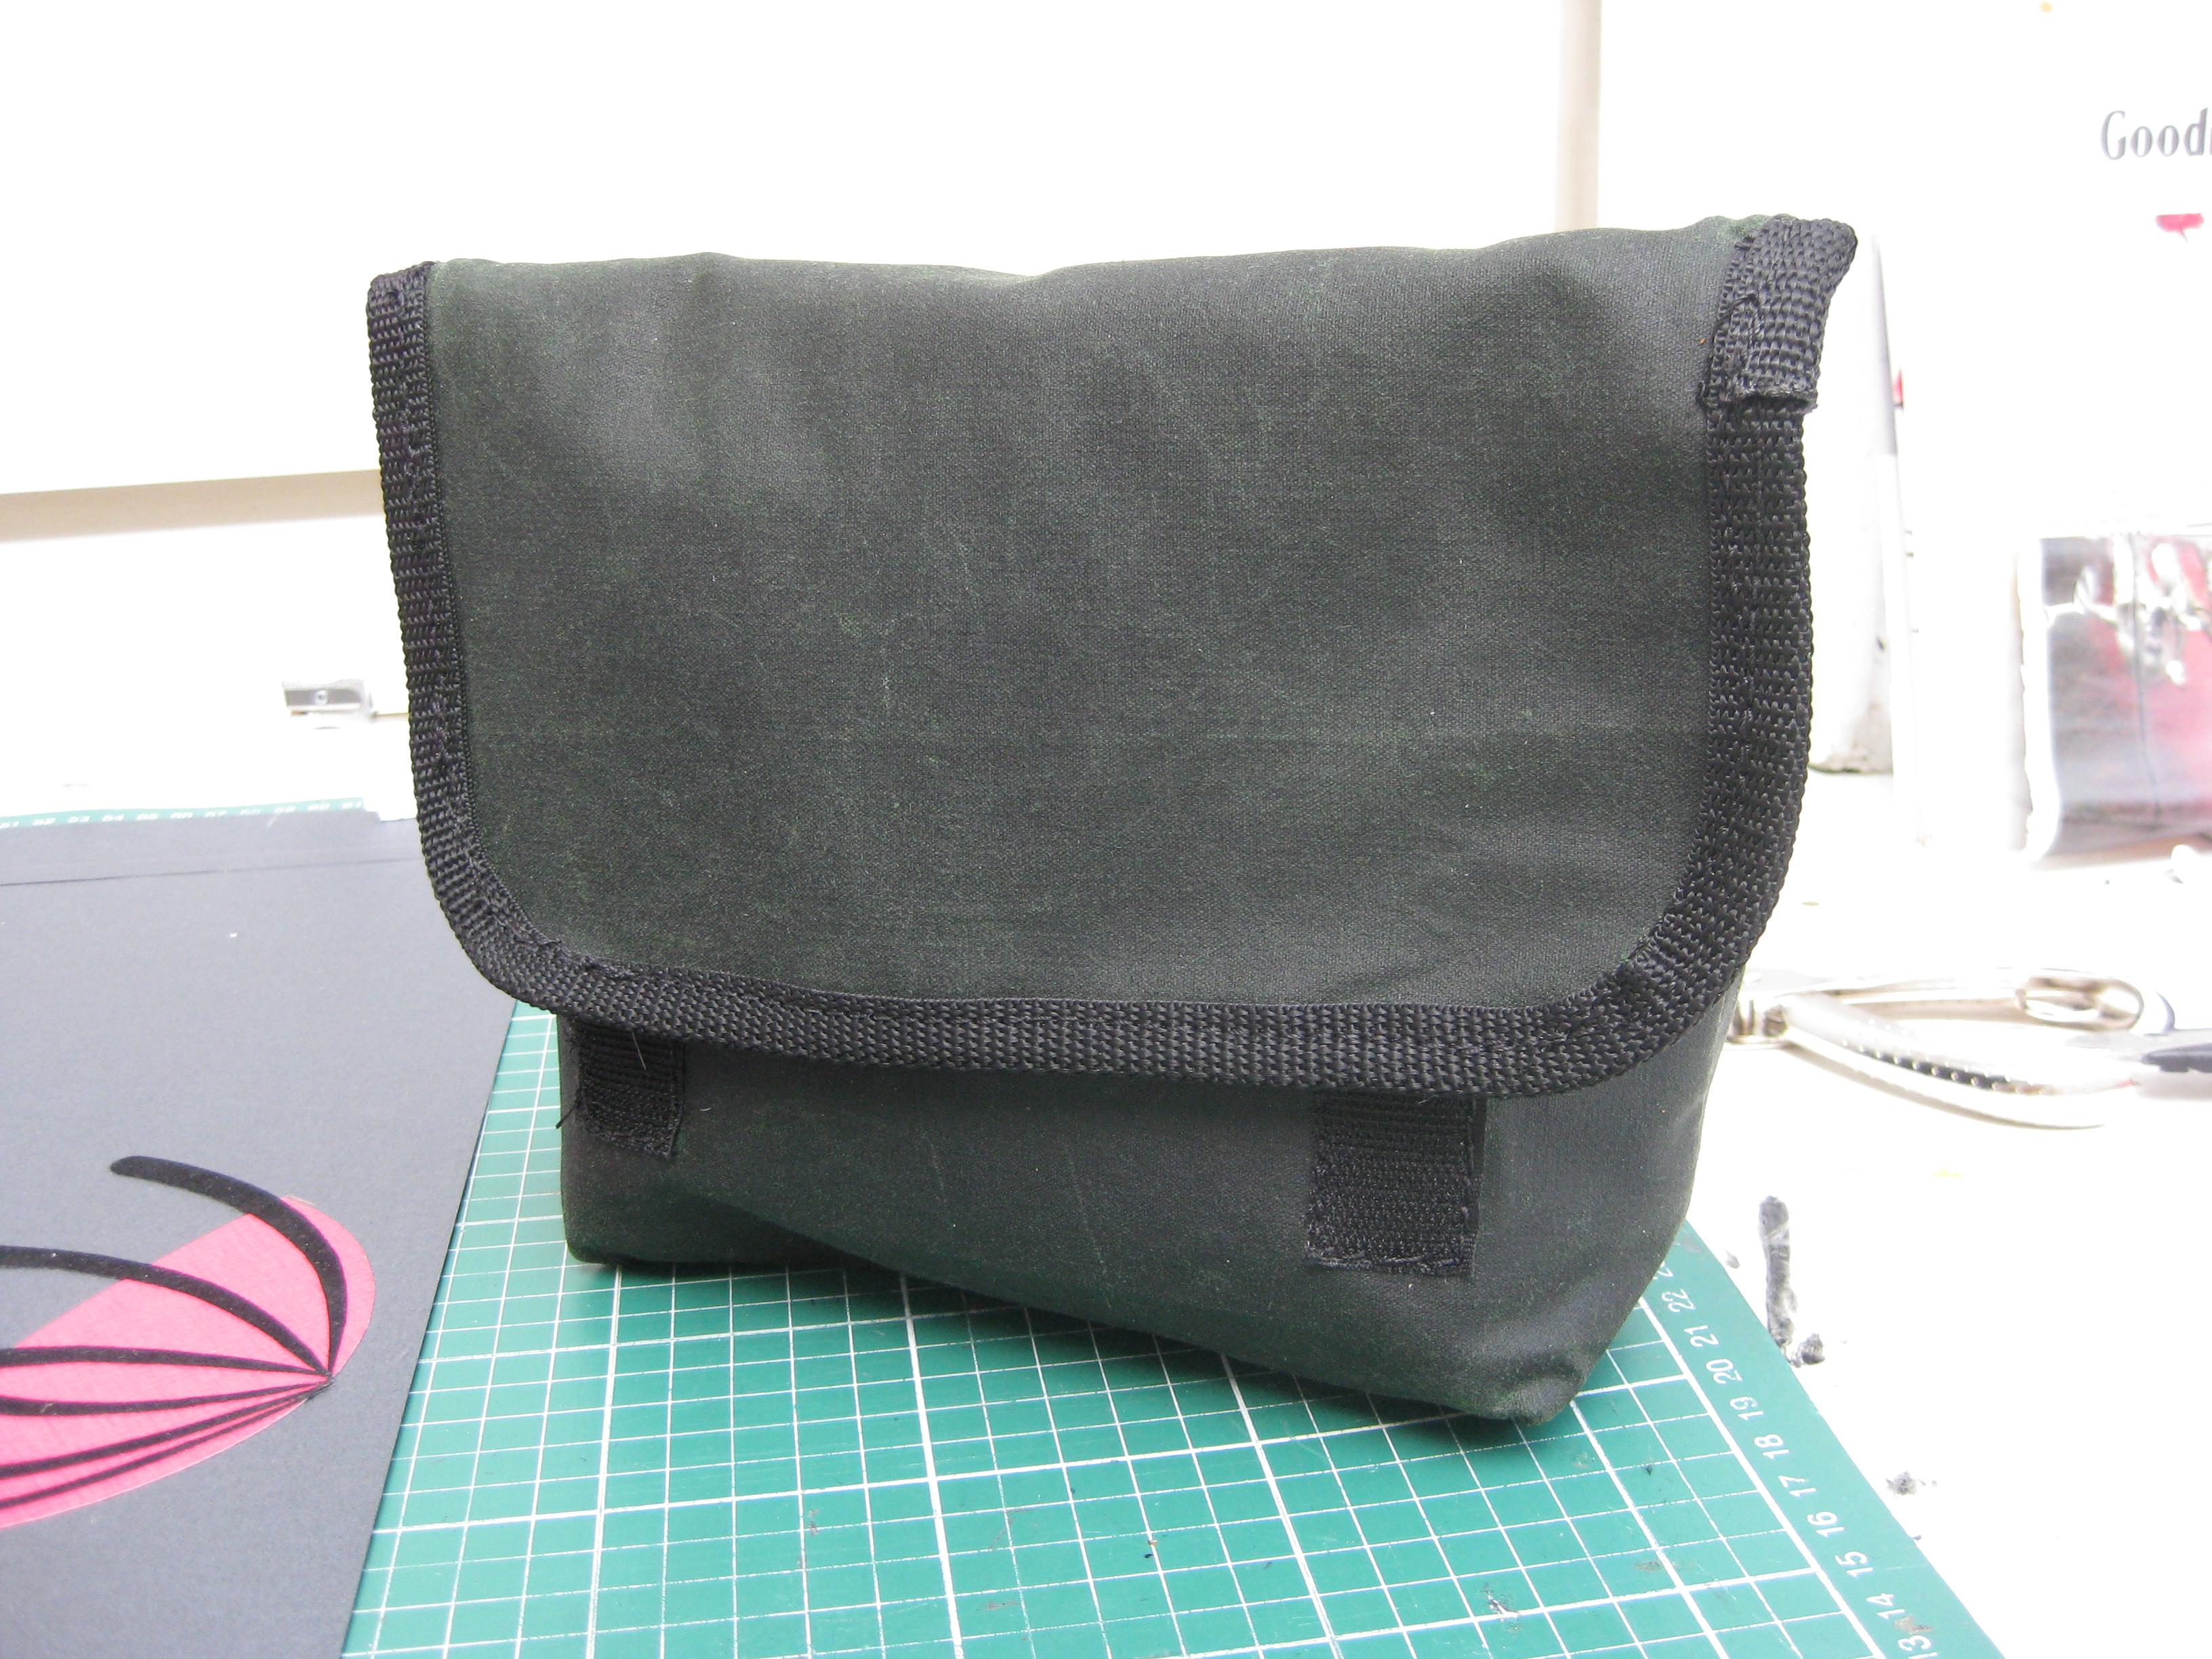 waxed linen thread Black 24 ply